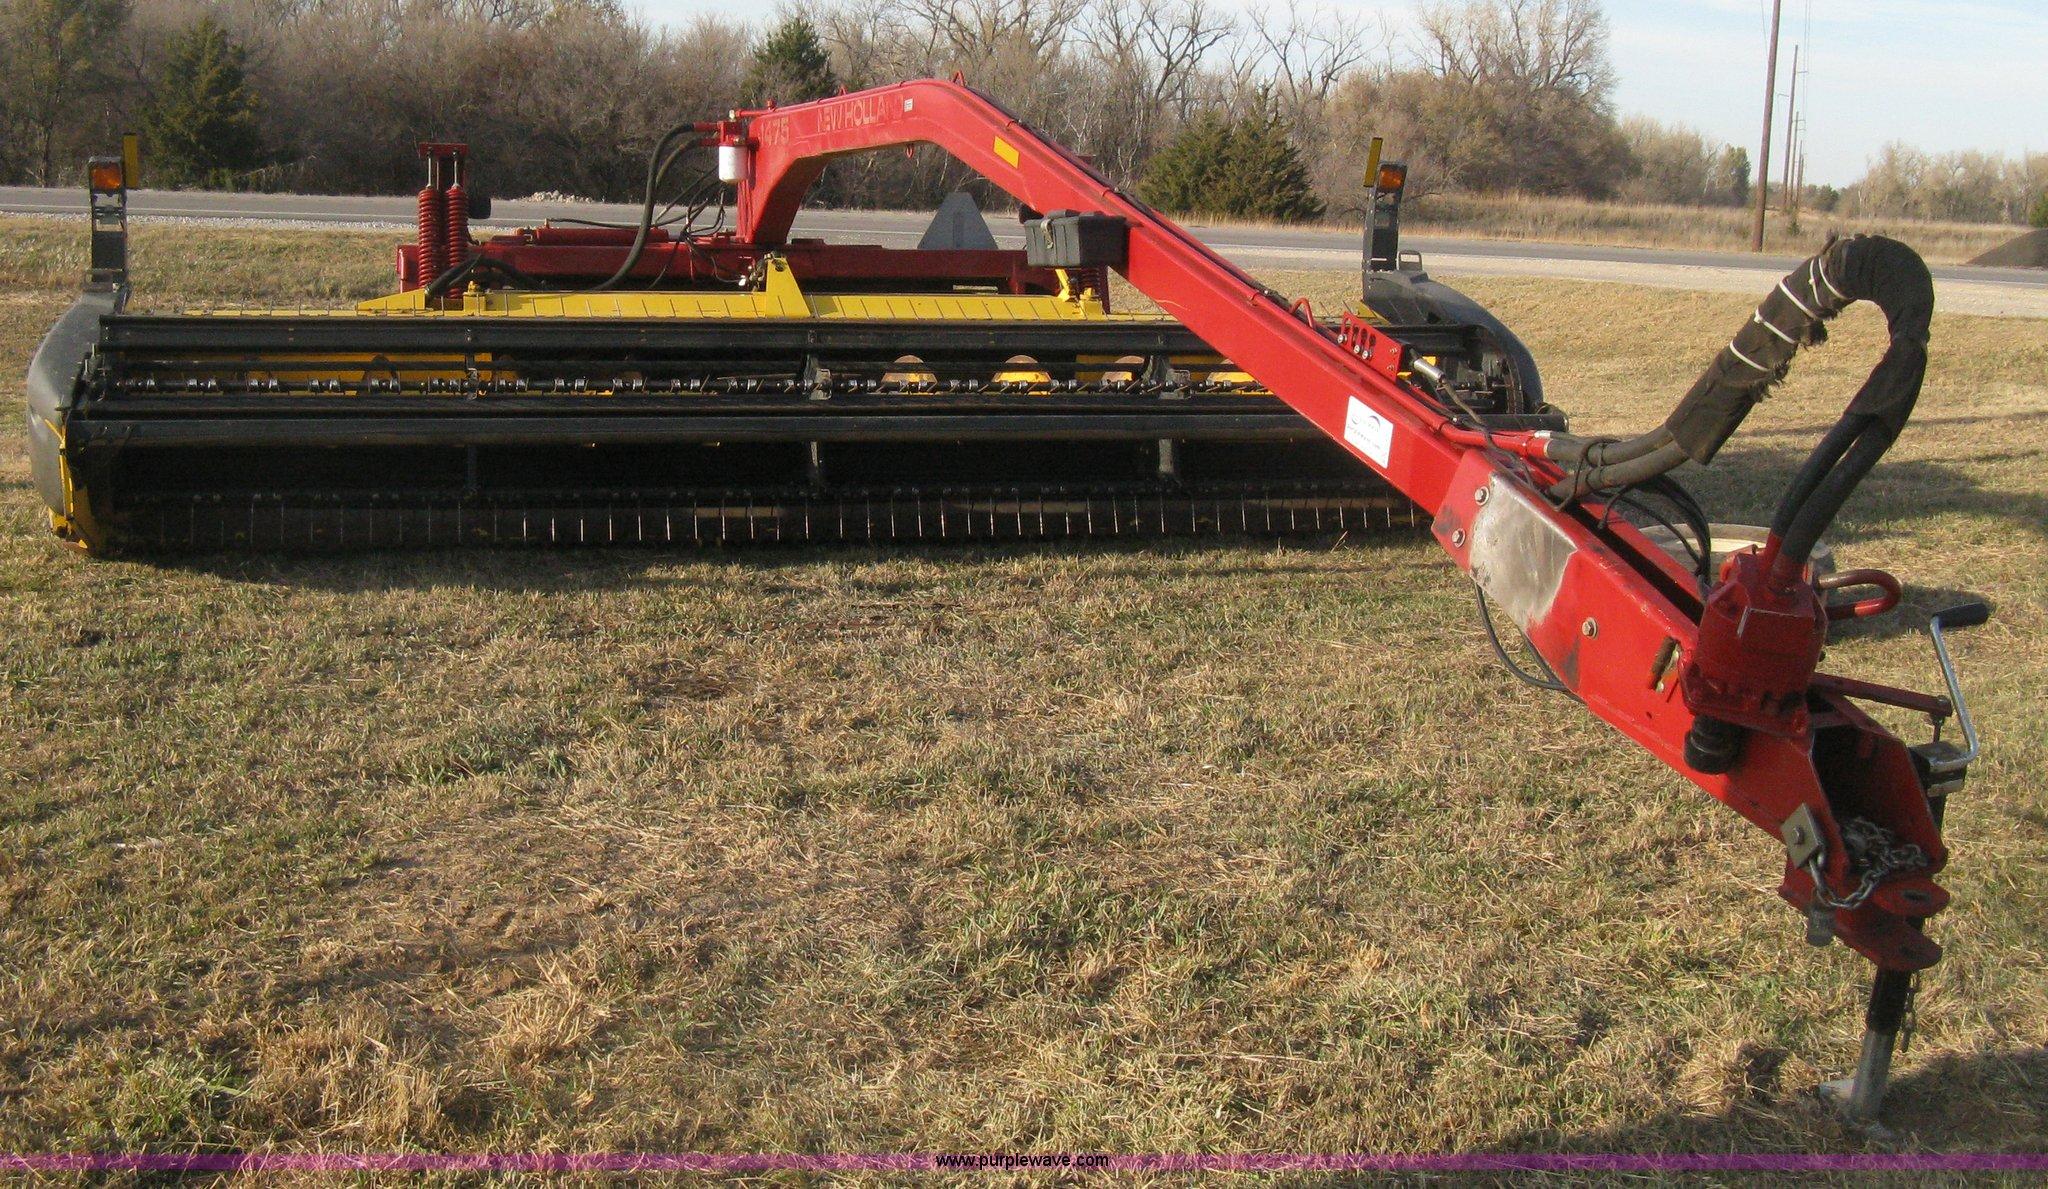 2004 New Holland 1475 HS Series haybine swather   Item H4370